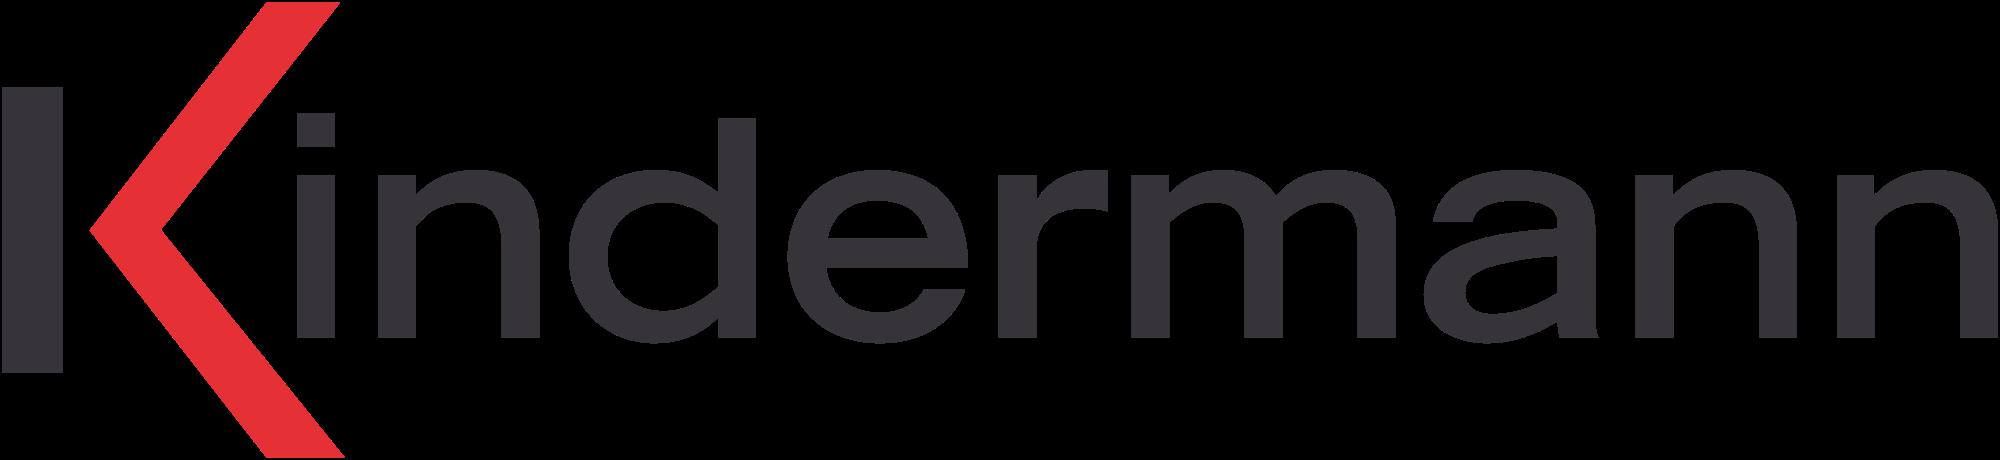 Kndermann